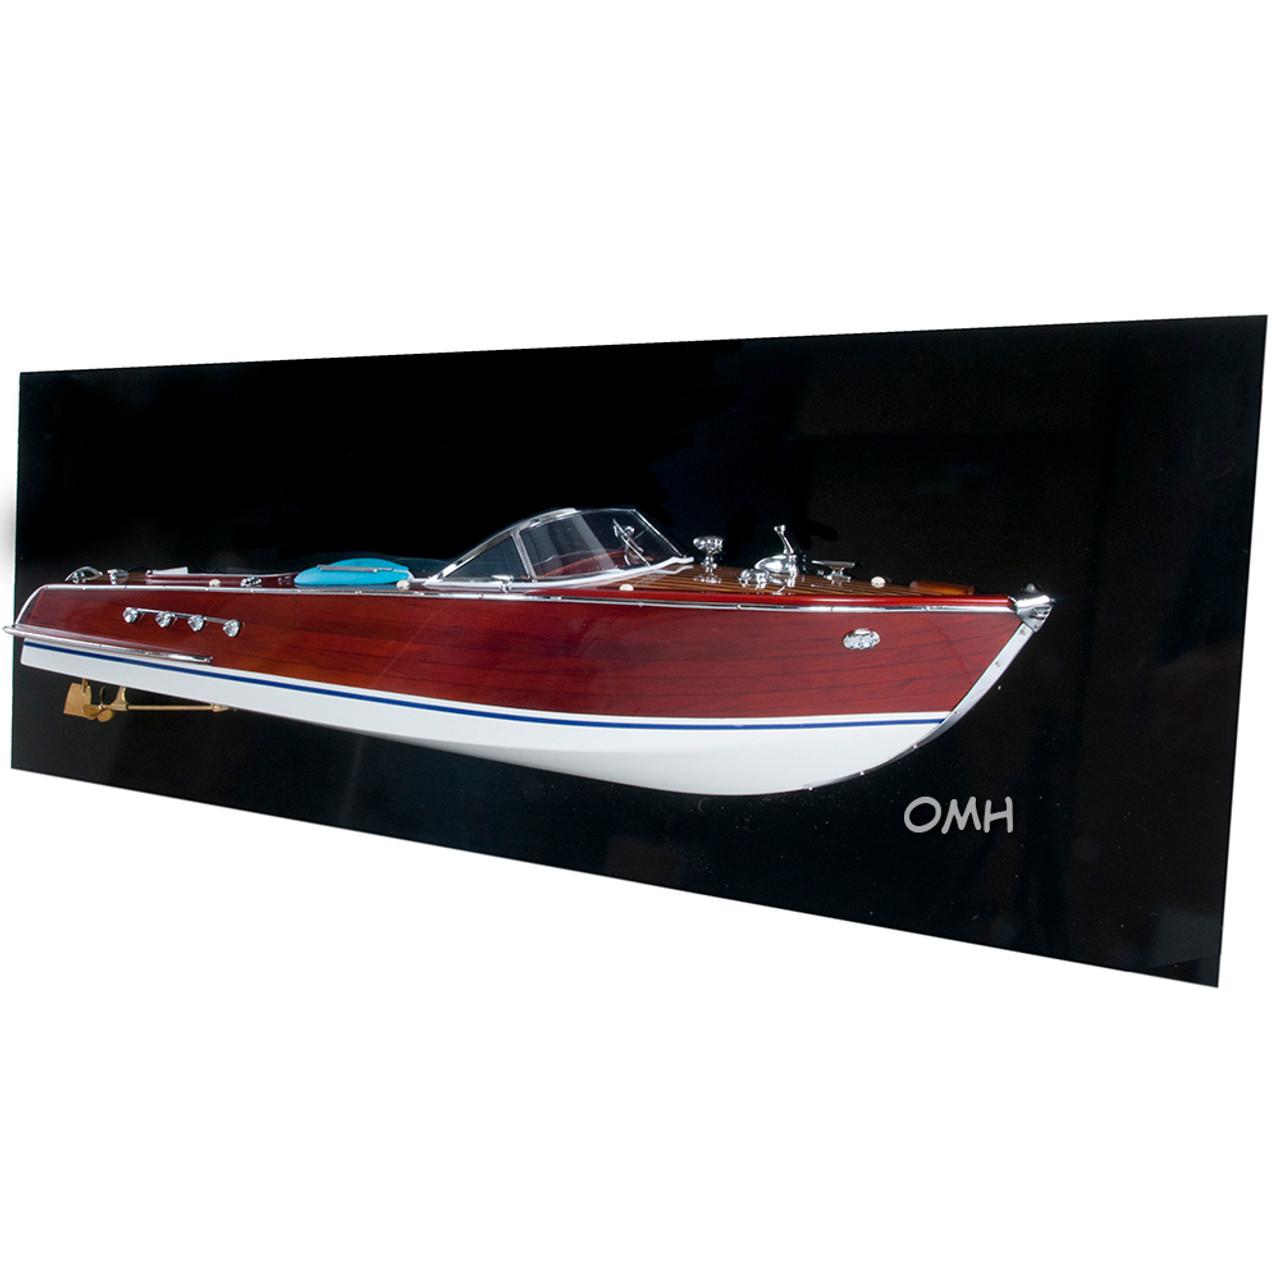 Riva Aquarama Half Hull Model Wooden Italian Speed Boat